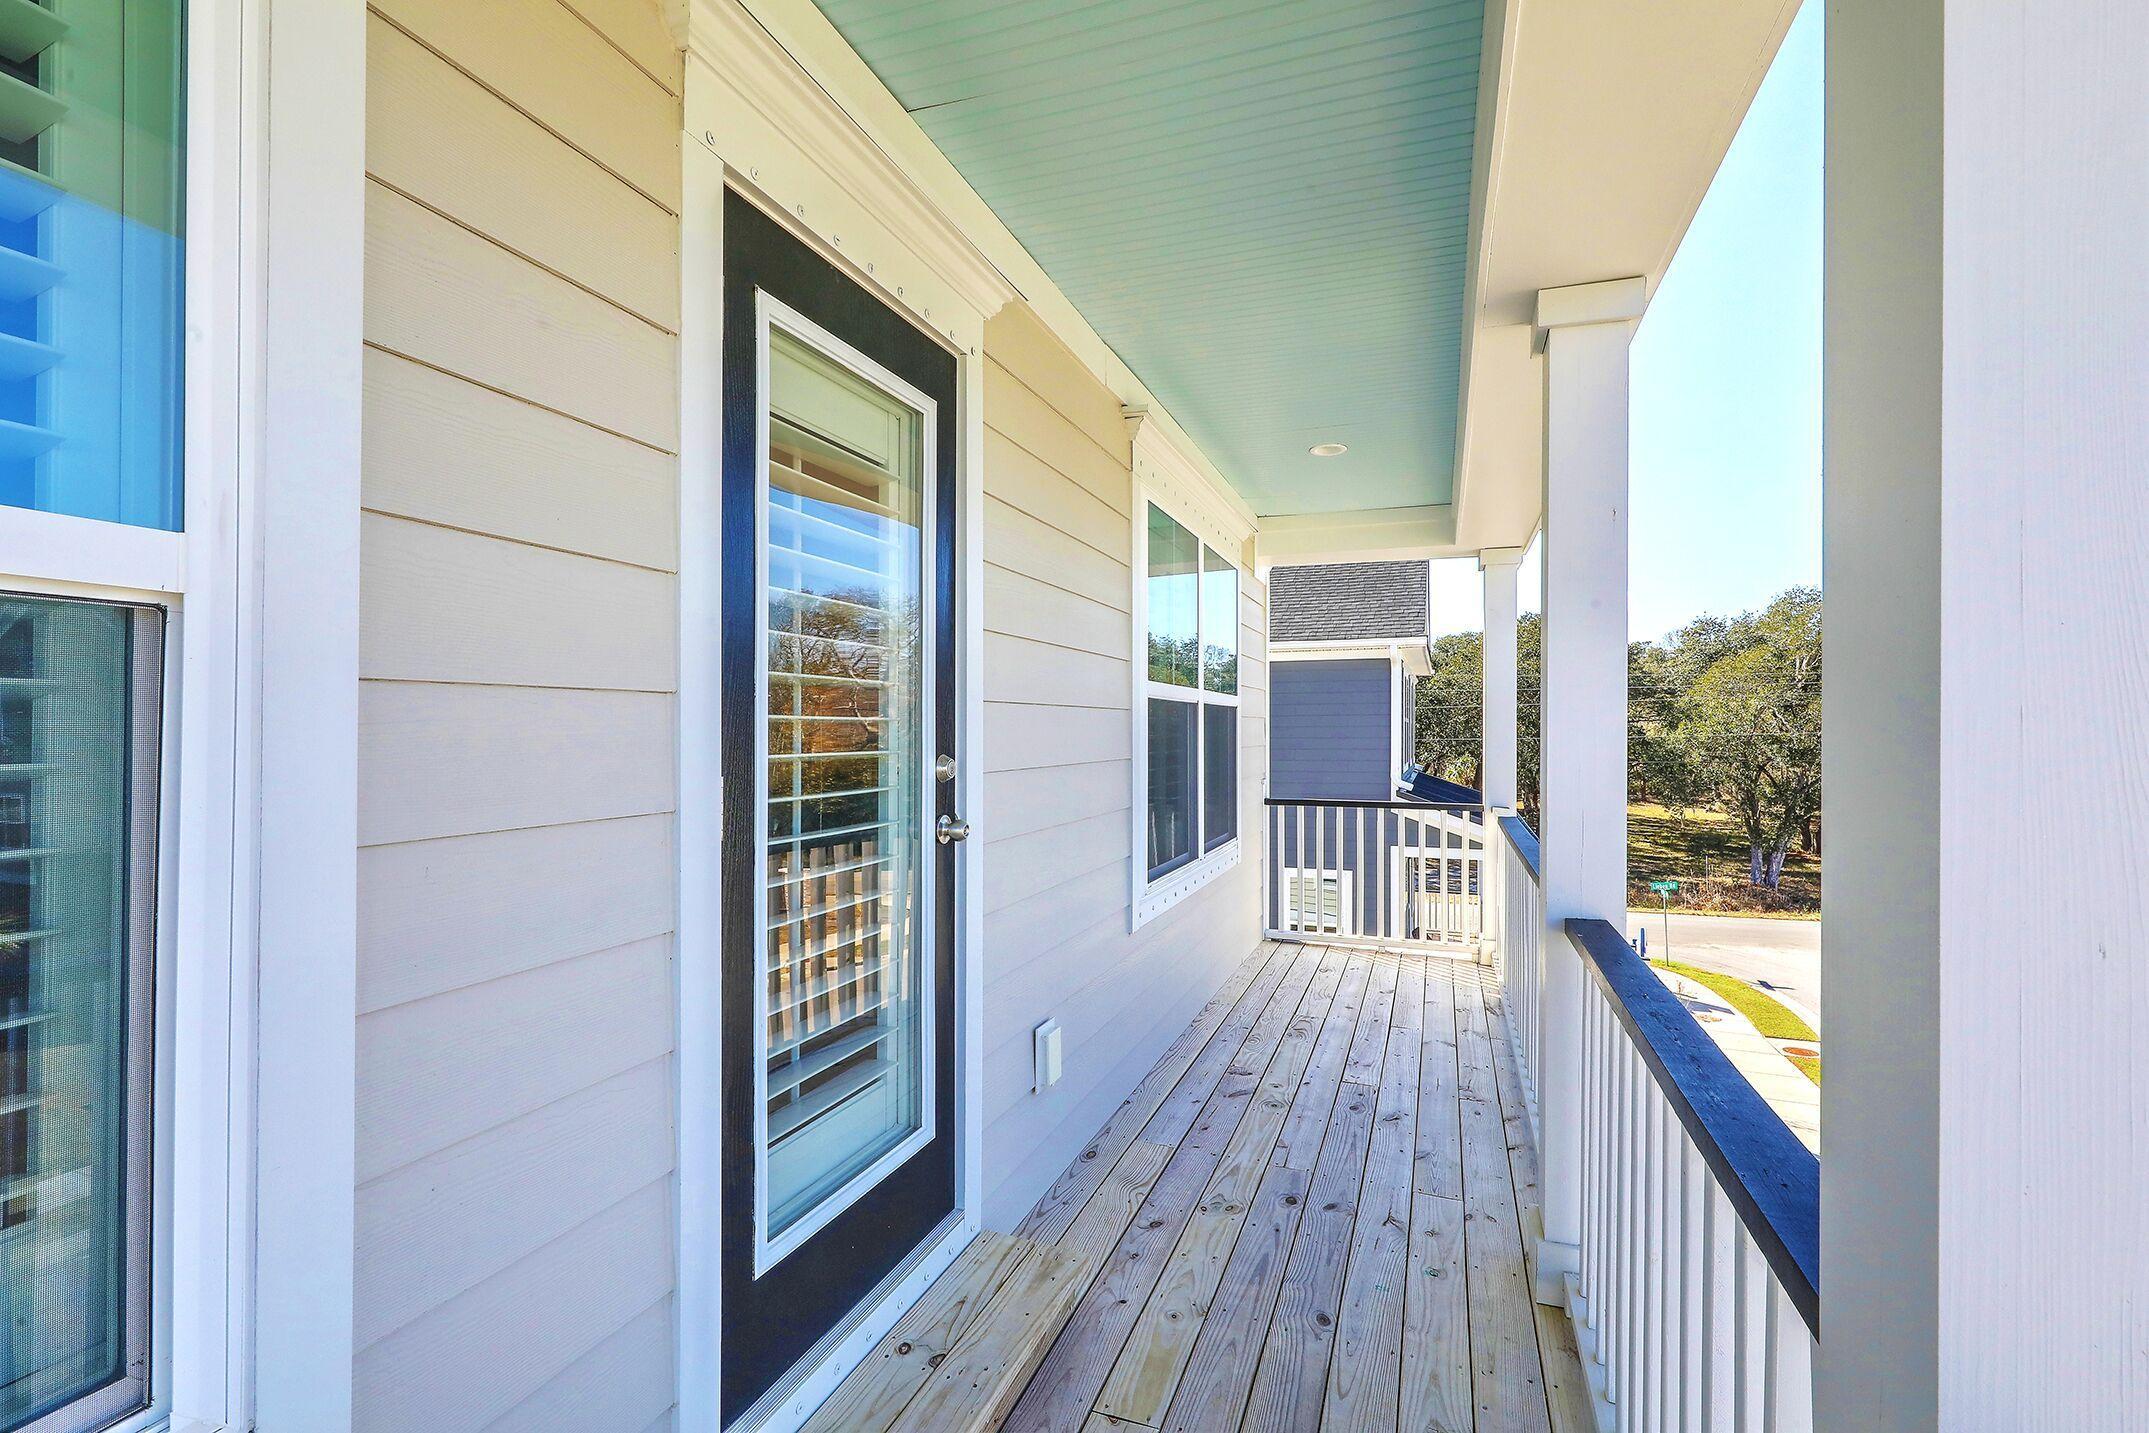 Copahee Landing Homes For Sale - 3731 Copahee Sound, Mount Pleasant, SC - 22